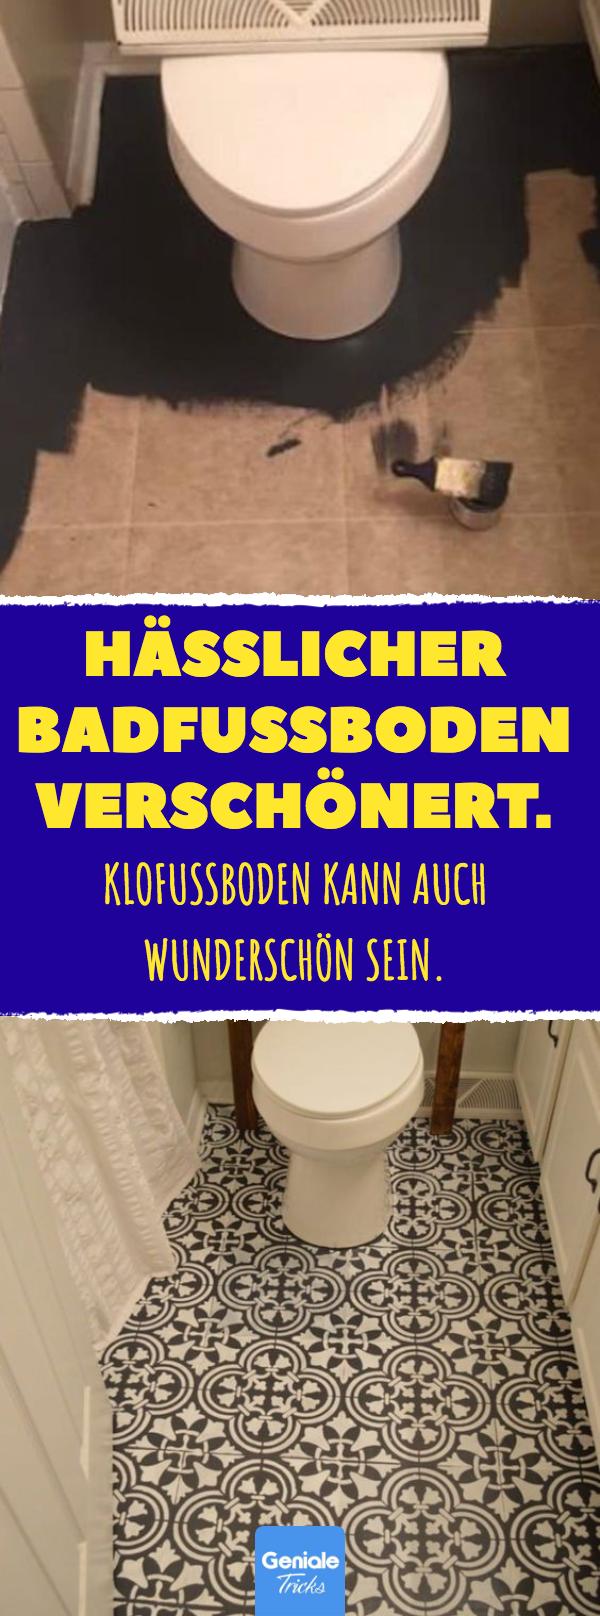 Hasslicher Badfussboden Verschonert Bad Toilette Badezimmer Fussboden Linoleum Pvc Fliesen Badezimmer Fussboden Badezimmerboden Bodenbelag Fur Badezimmer